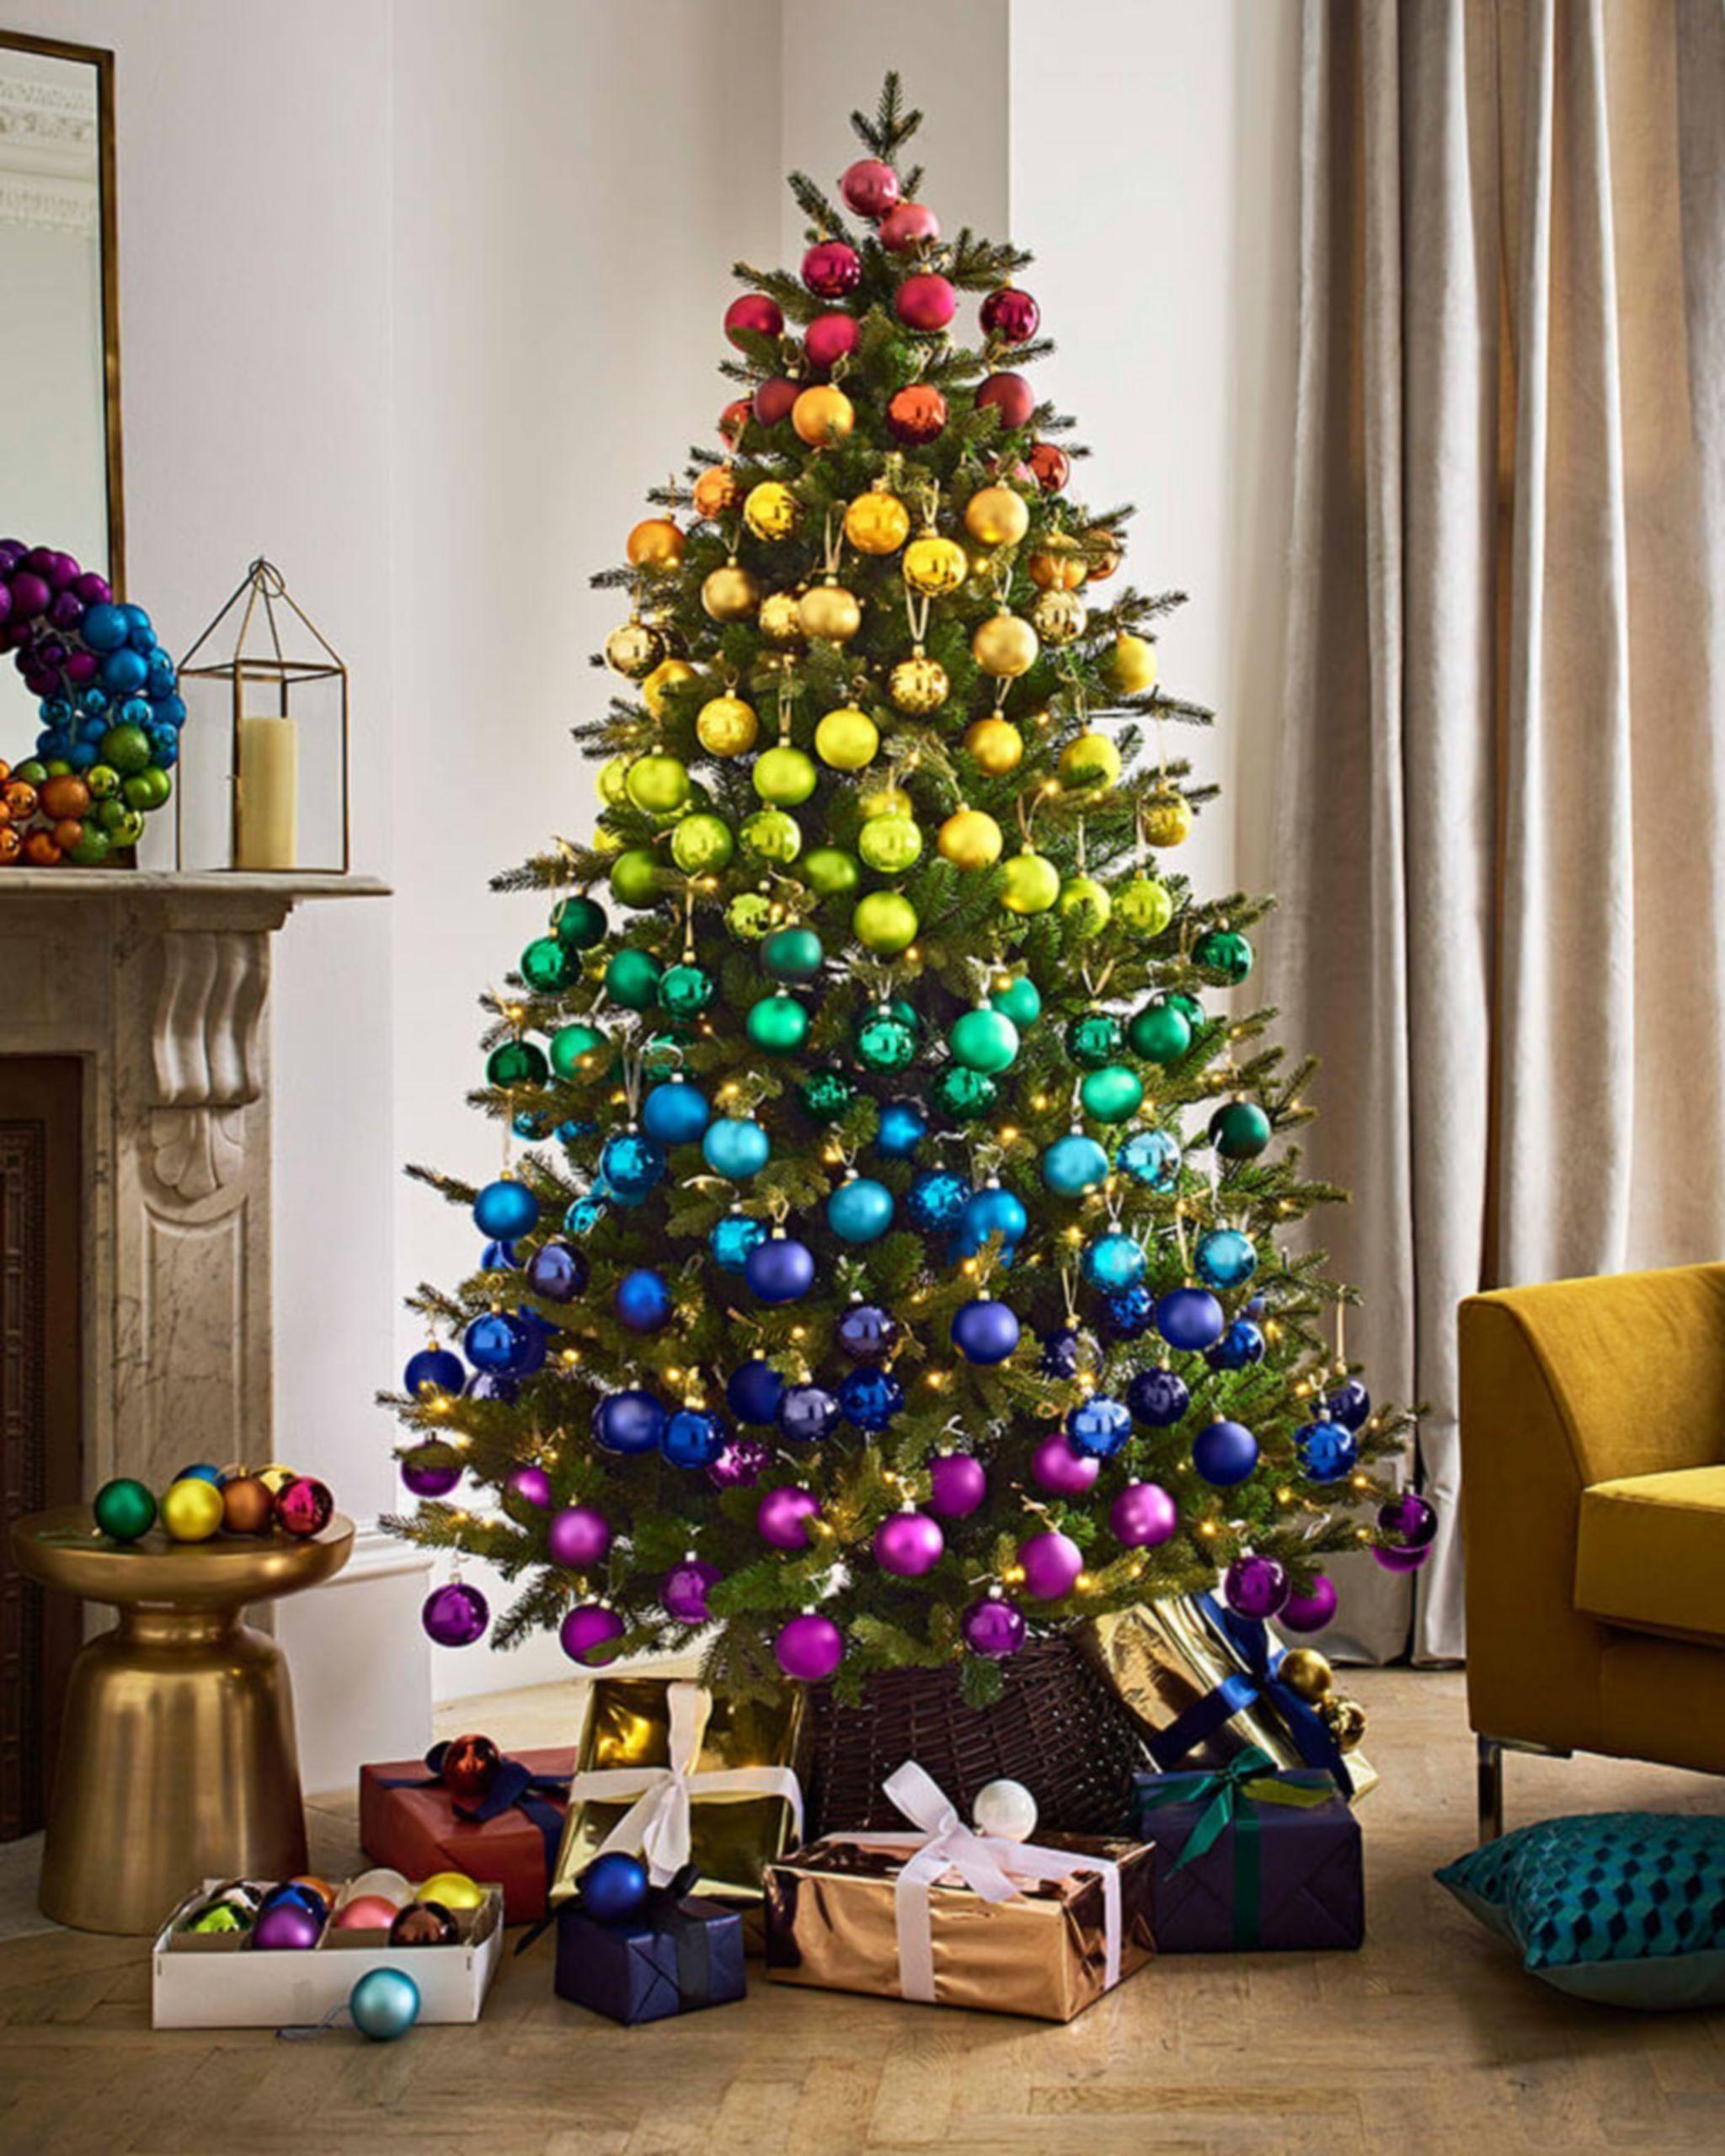 24 Creative And Unusual Diy Christmas Tree Ideas On A Budget Rainbow Christmas Tree Rainbows Christmas Unusual Christmas Trees